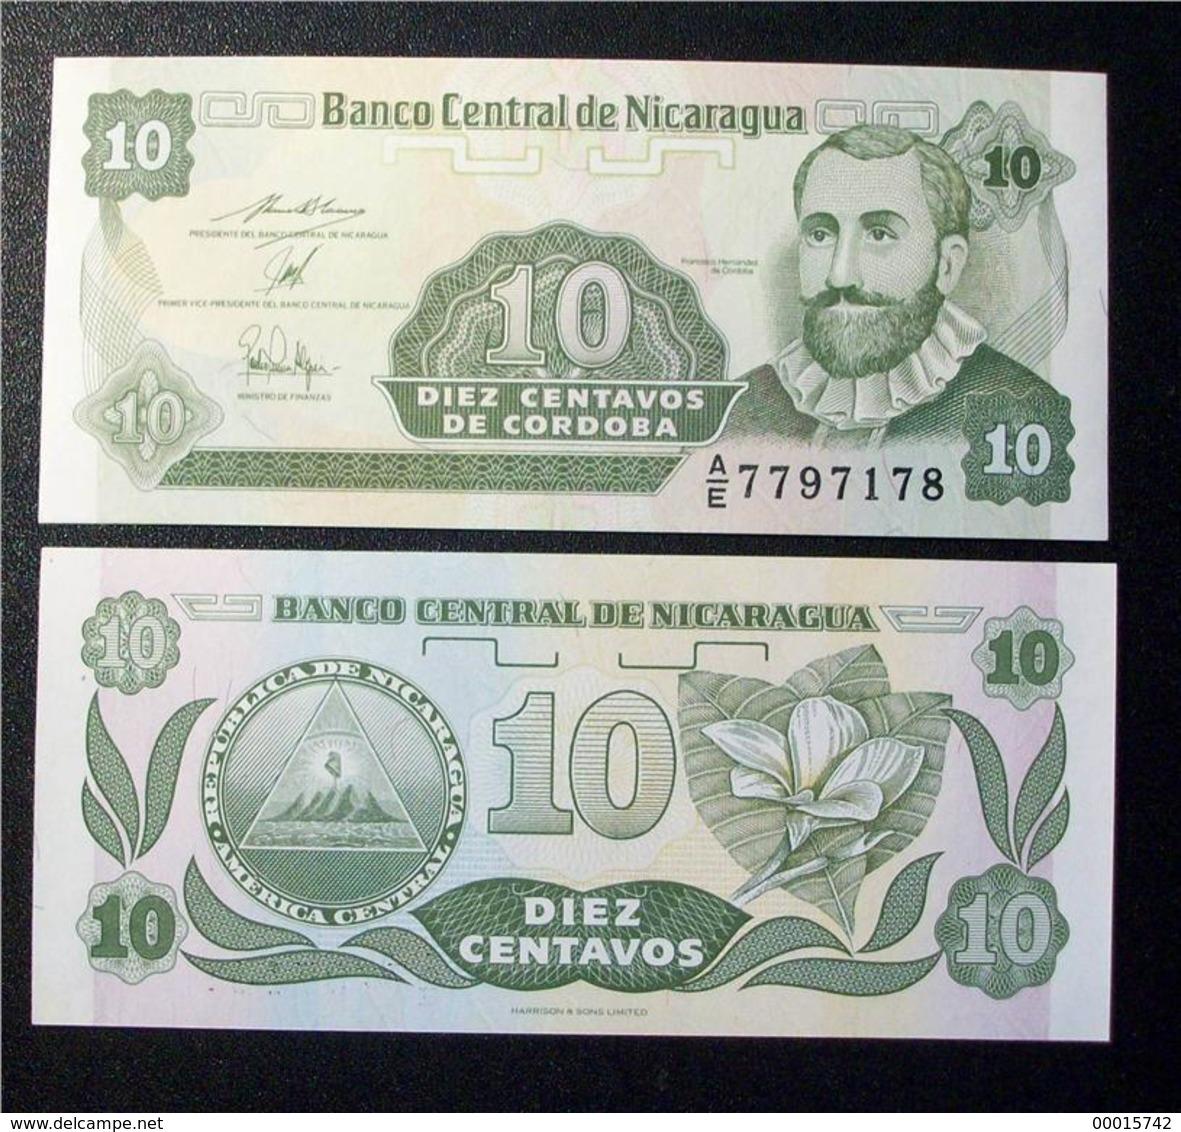 Nicaragua 10 Centavos 1991 P-169 UNC - Nicaragua